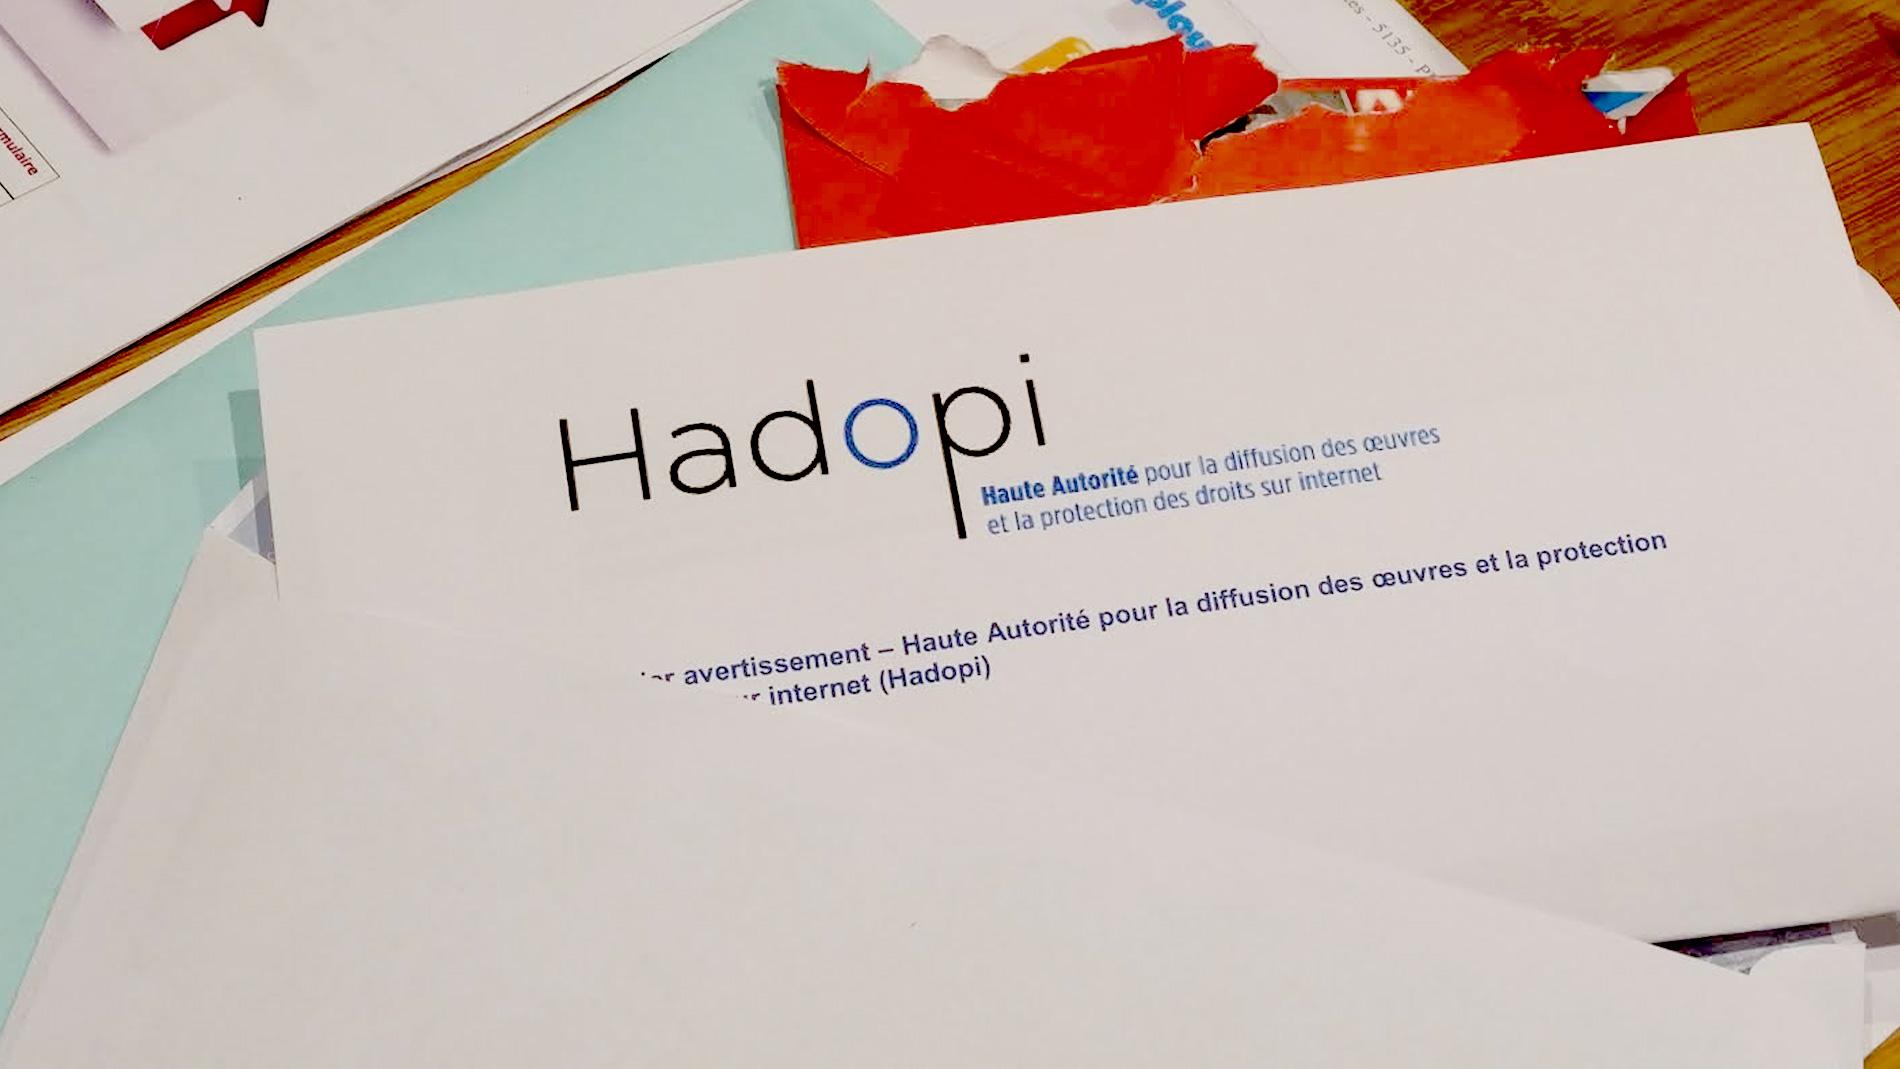 hadopi lettre Hadopi : une FAQ pour tout savoir   Politique   Numerama hadopi lettre